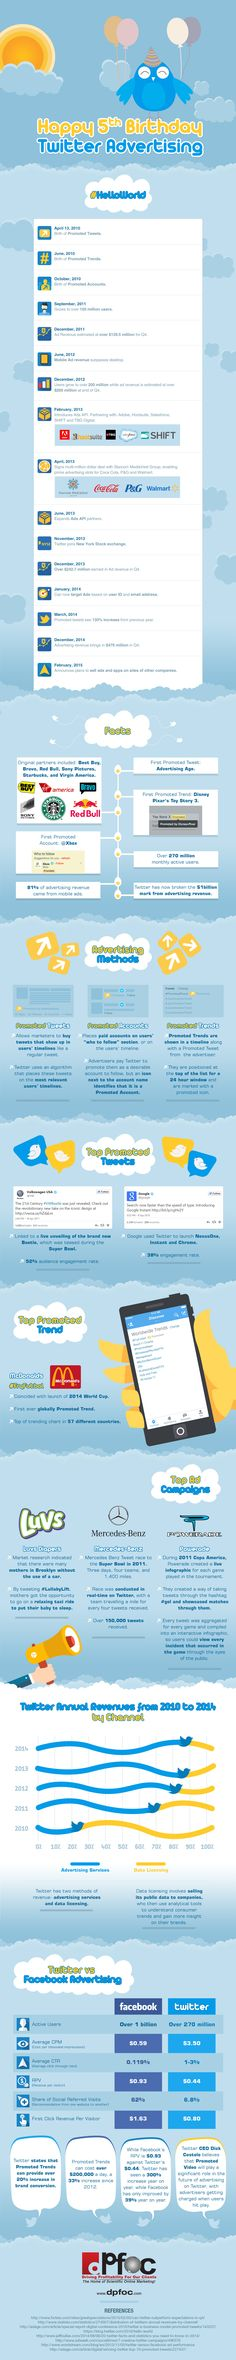 Happy 5th Birthday Twitter Advertising #infographic #Twitter #Advertising #SocialMedia